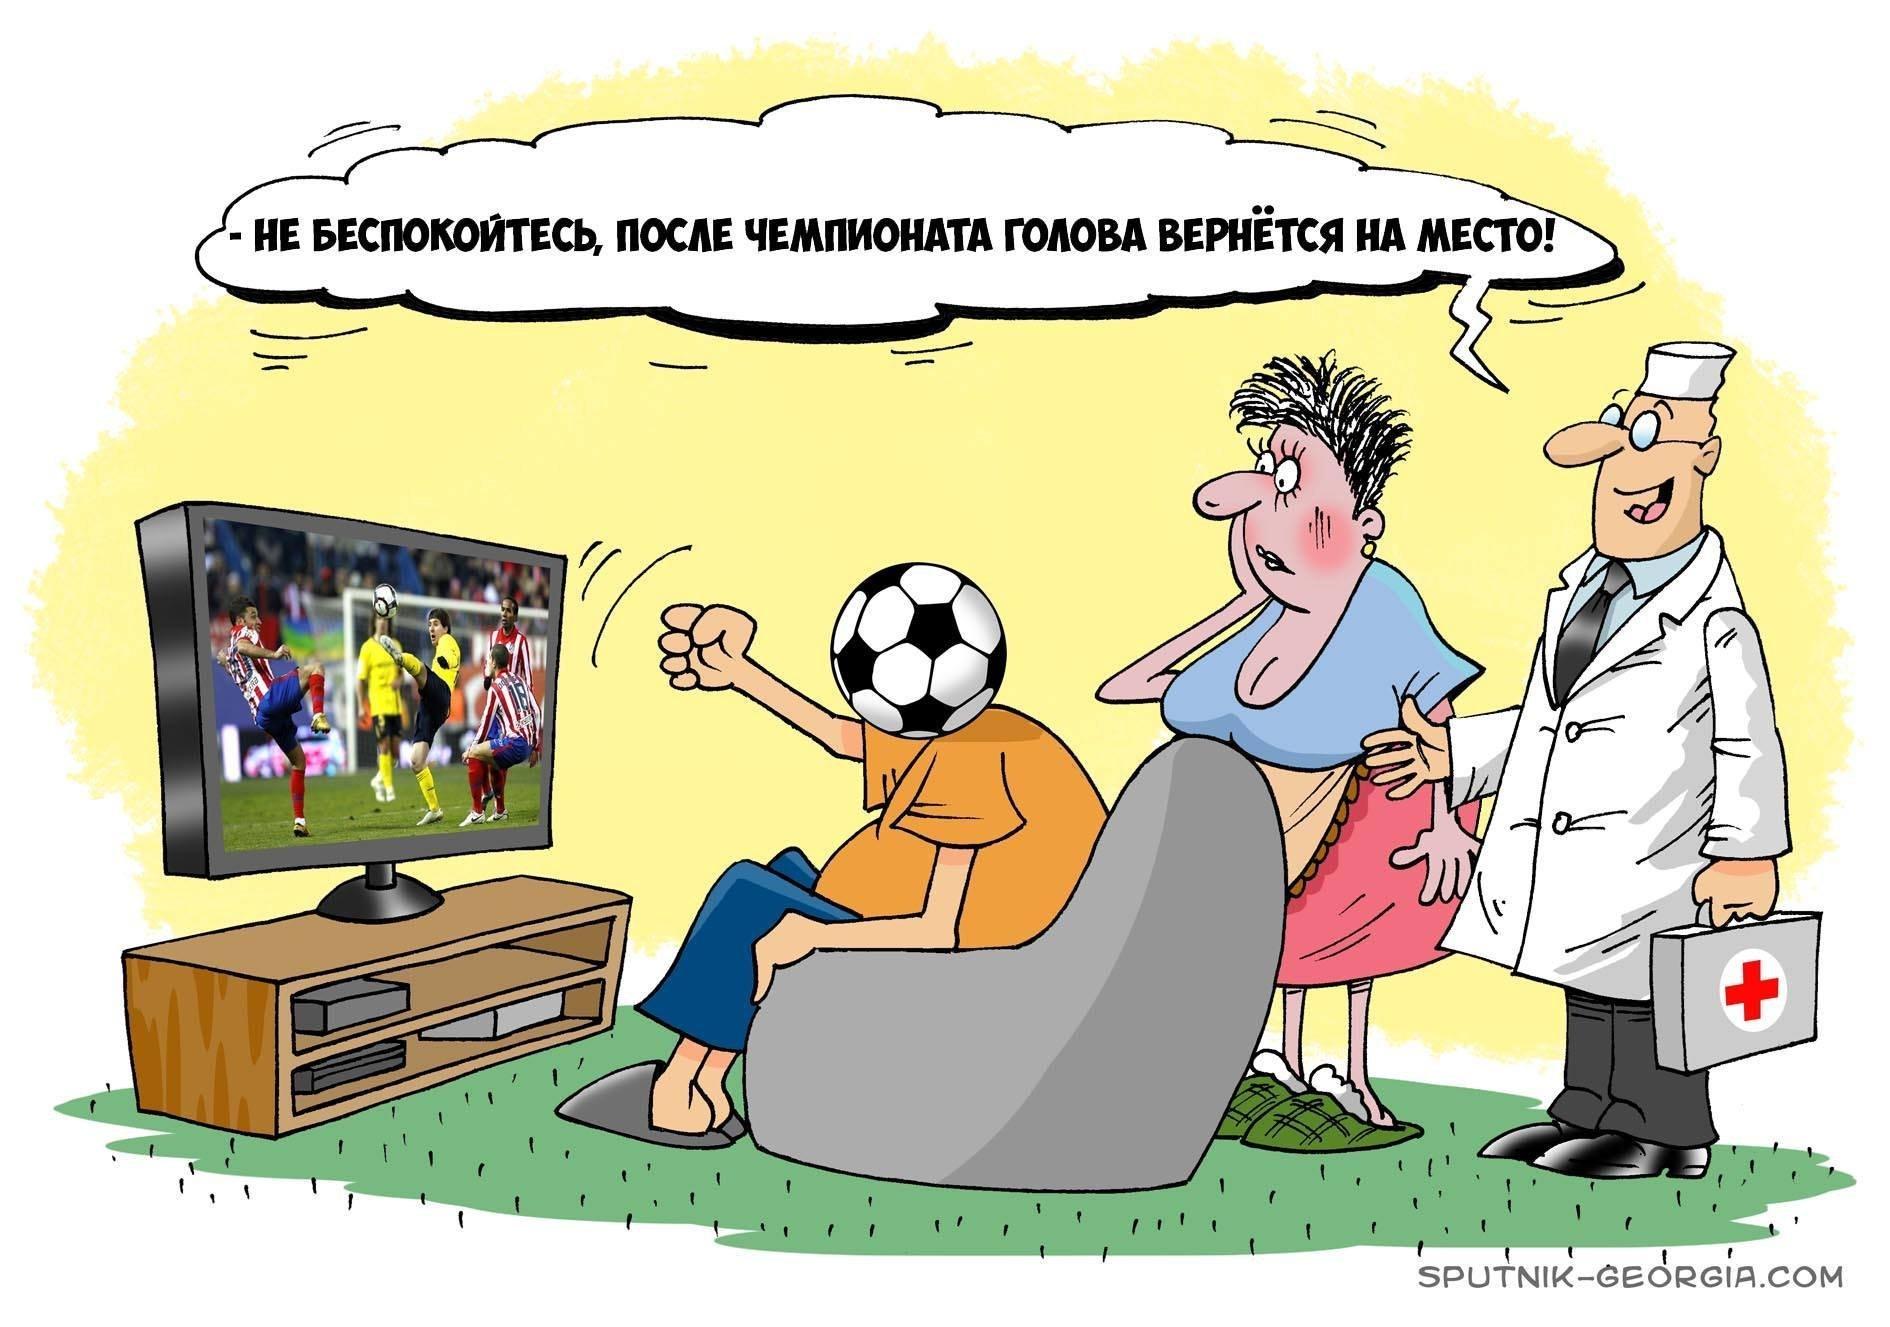 ЕВРО-2016 - Голова вернется на место после чемпионата!